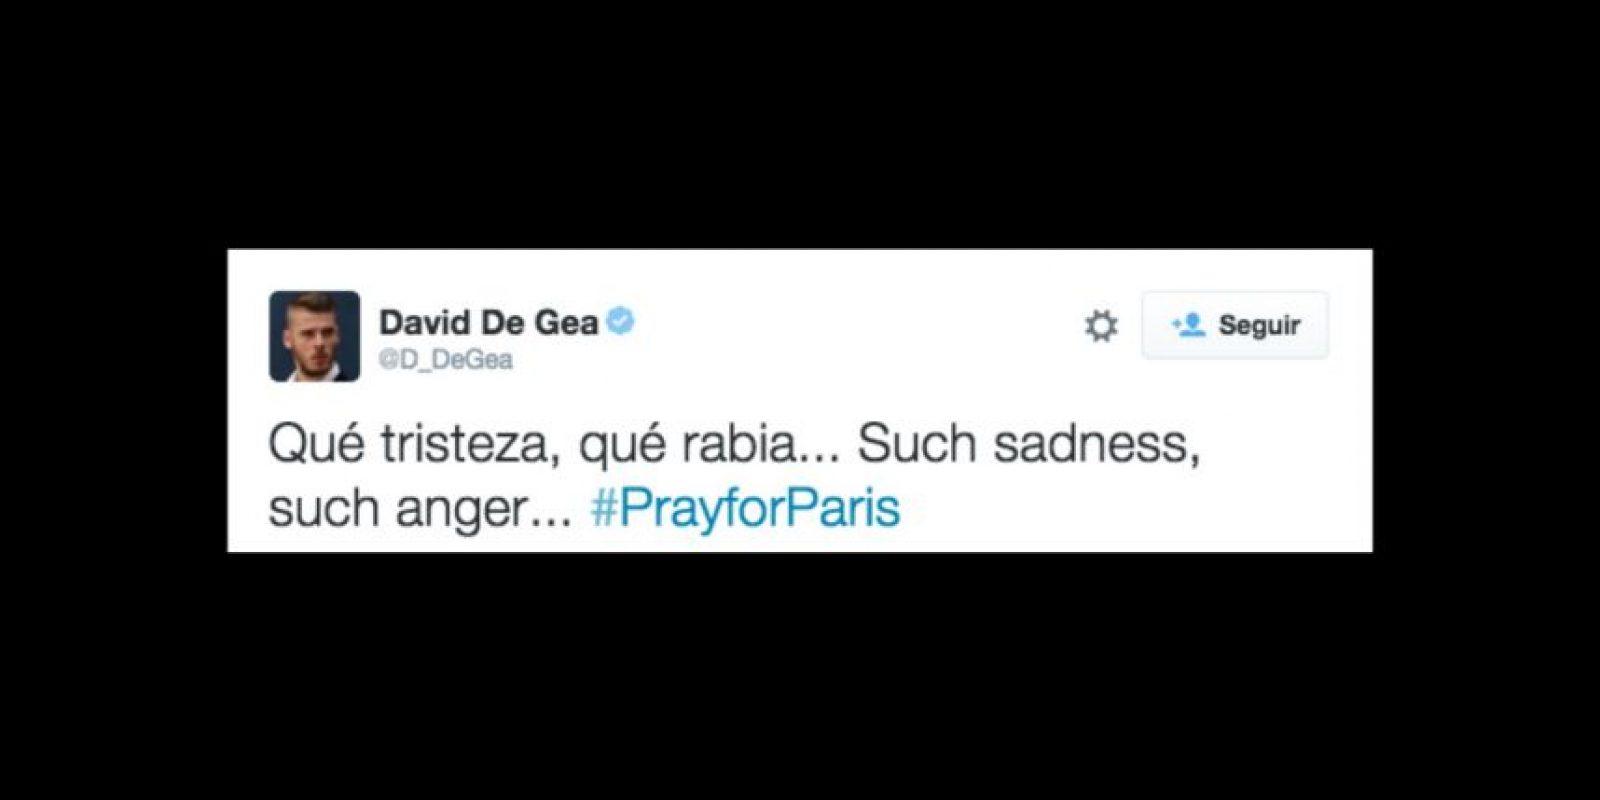 David de Gea: Qué tristeza, qué rabia. Foto:Vía twitter.com/D_DeGea